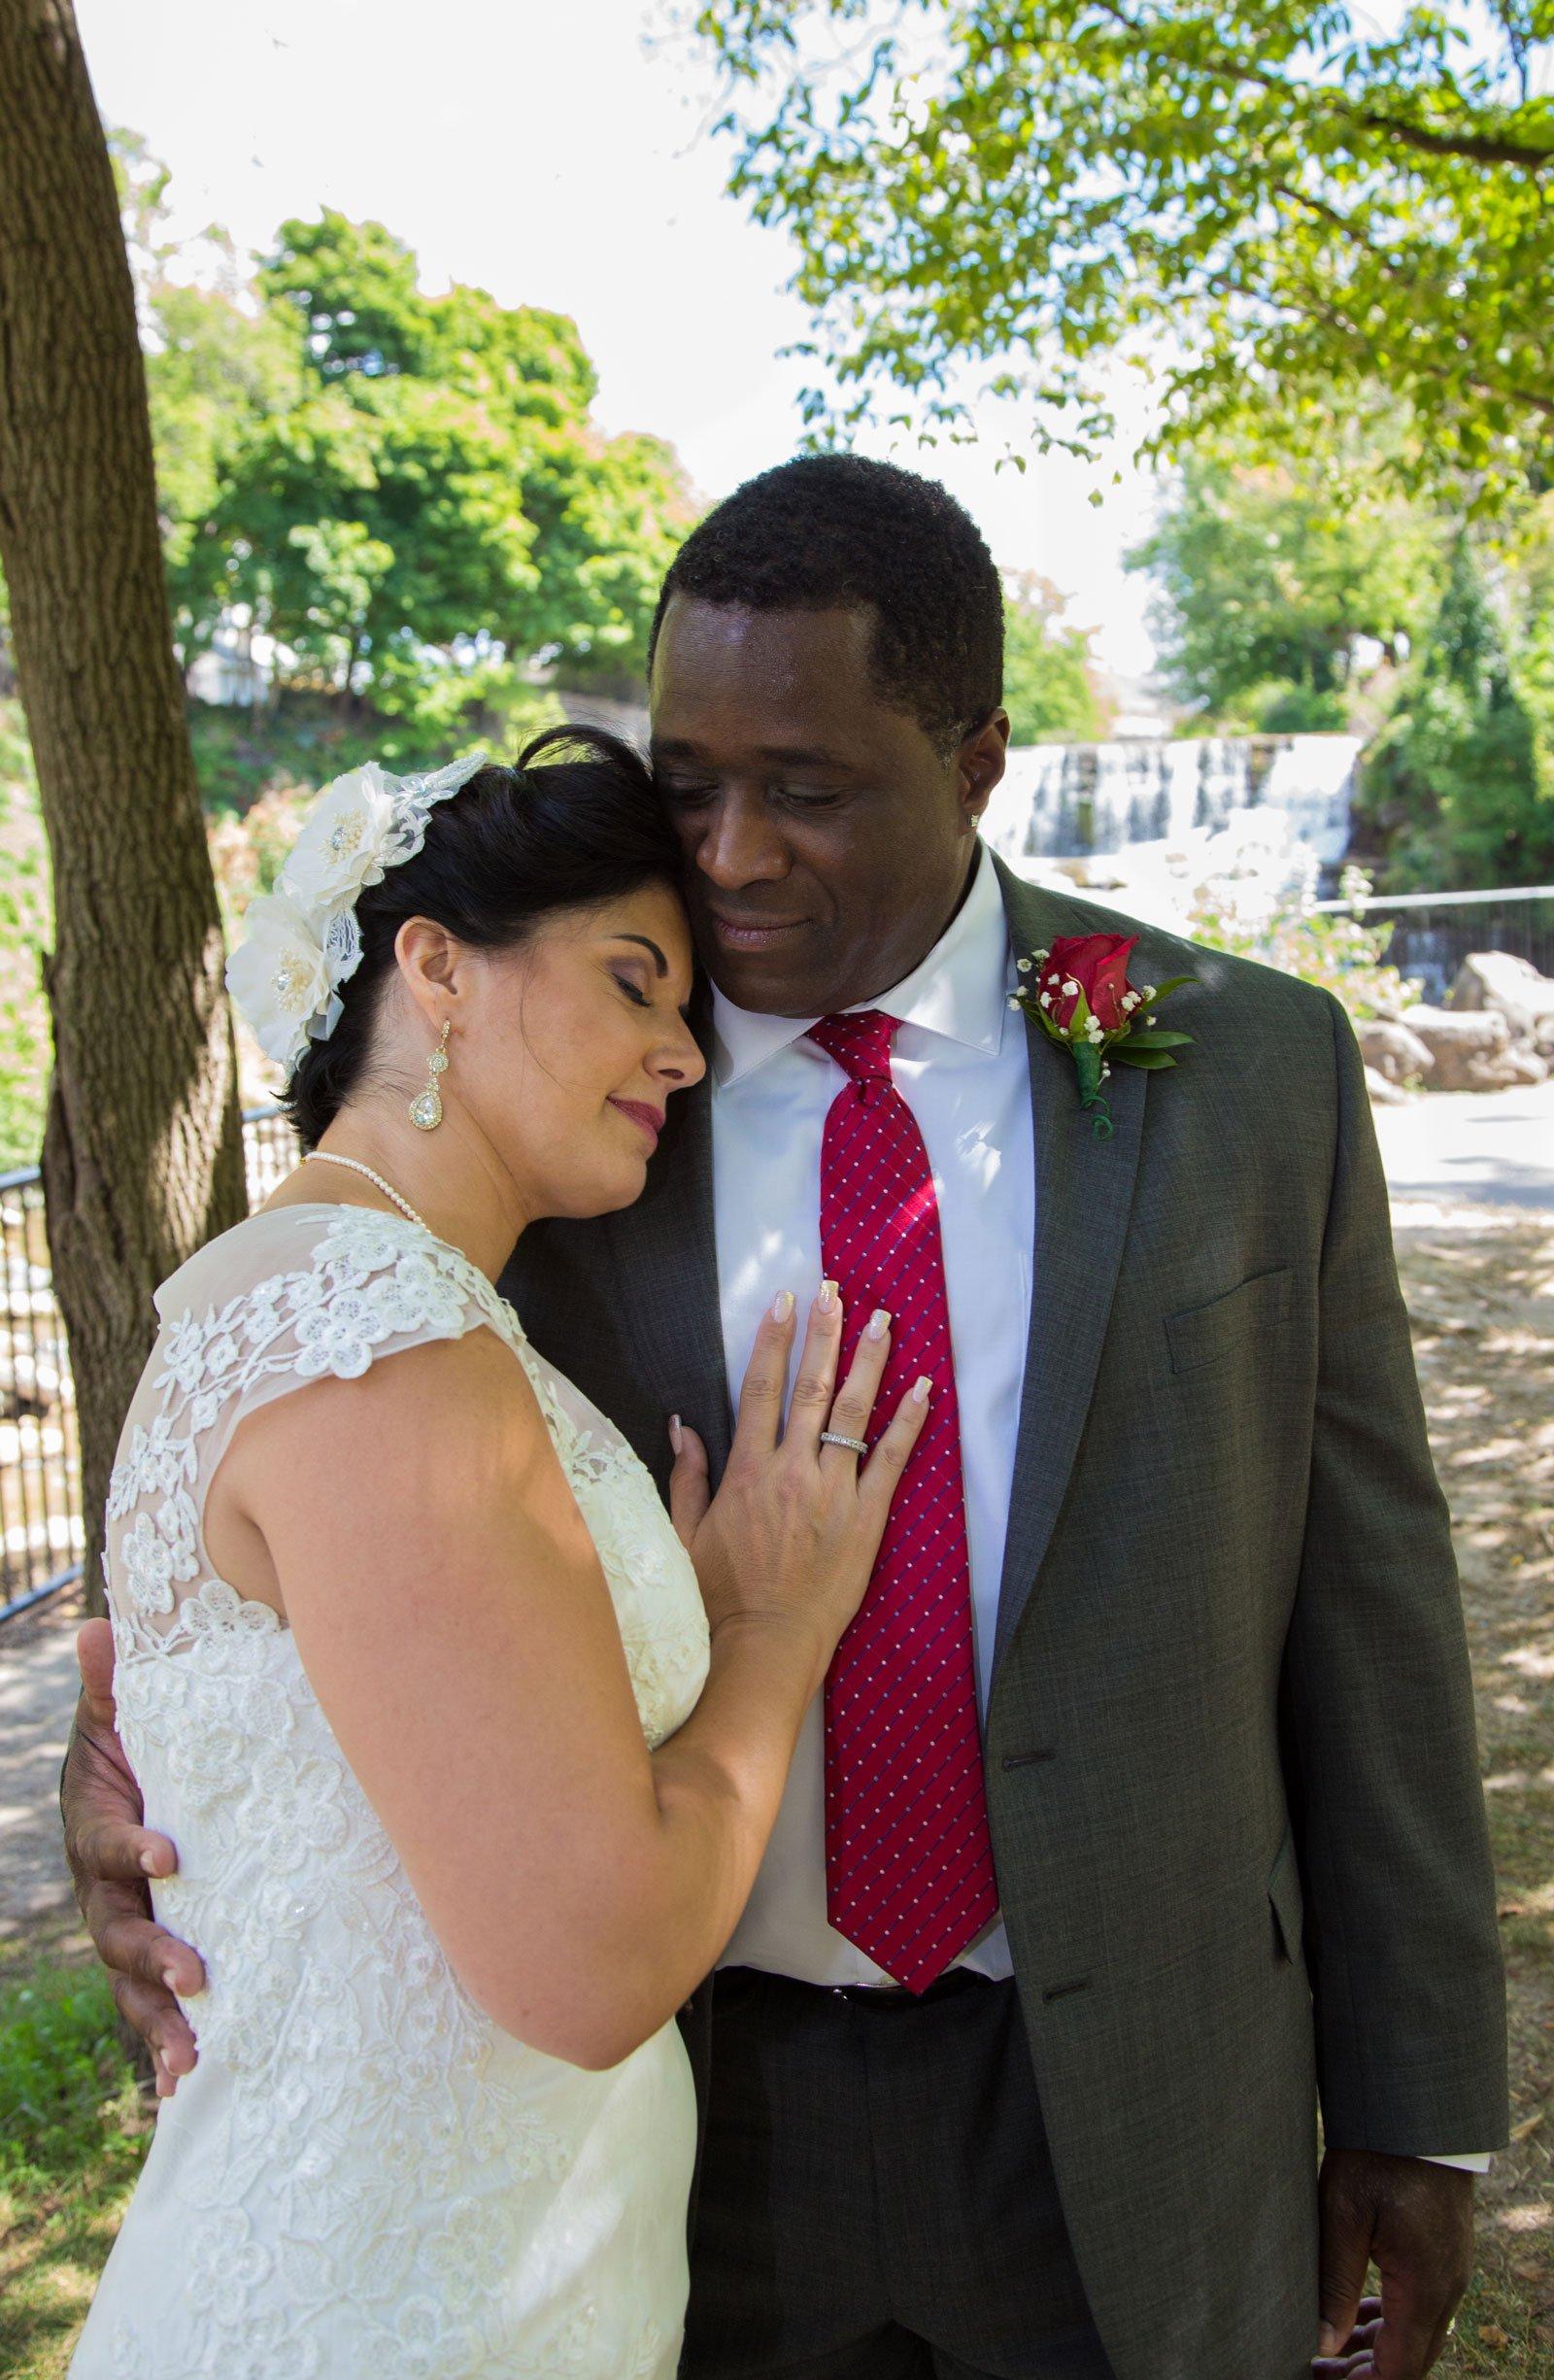 Williamsville, NY Wedding bride with groom